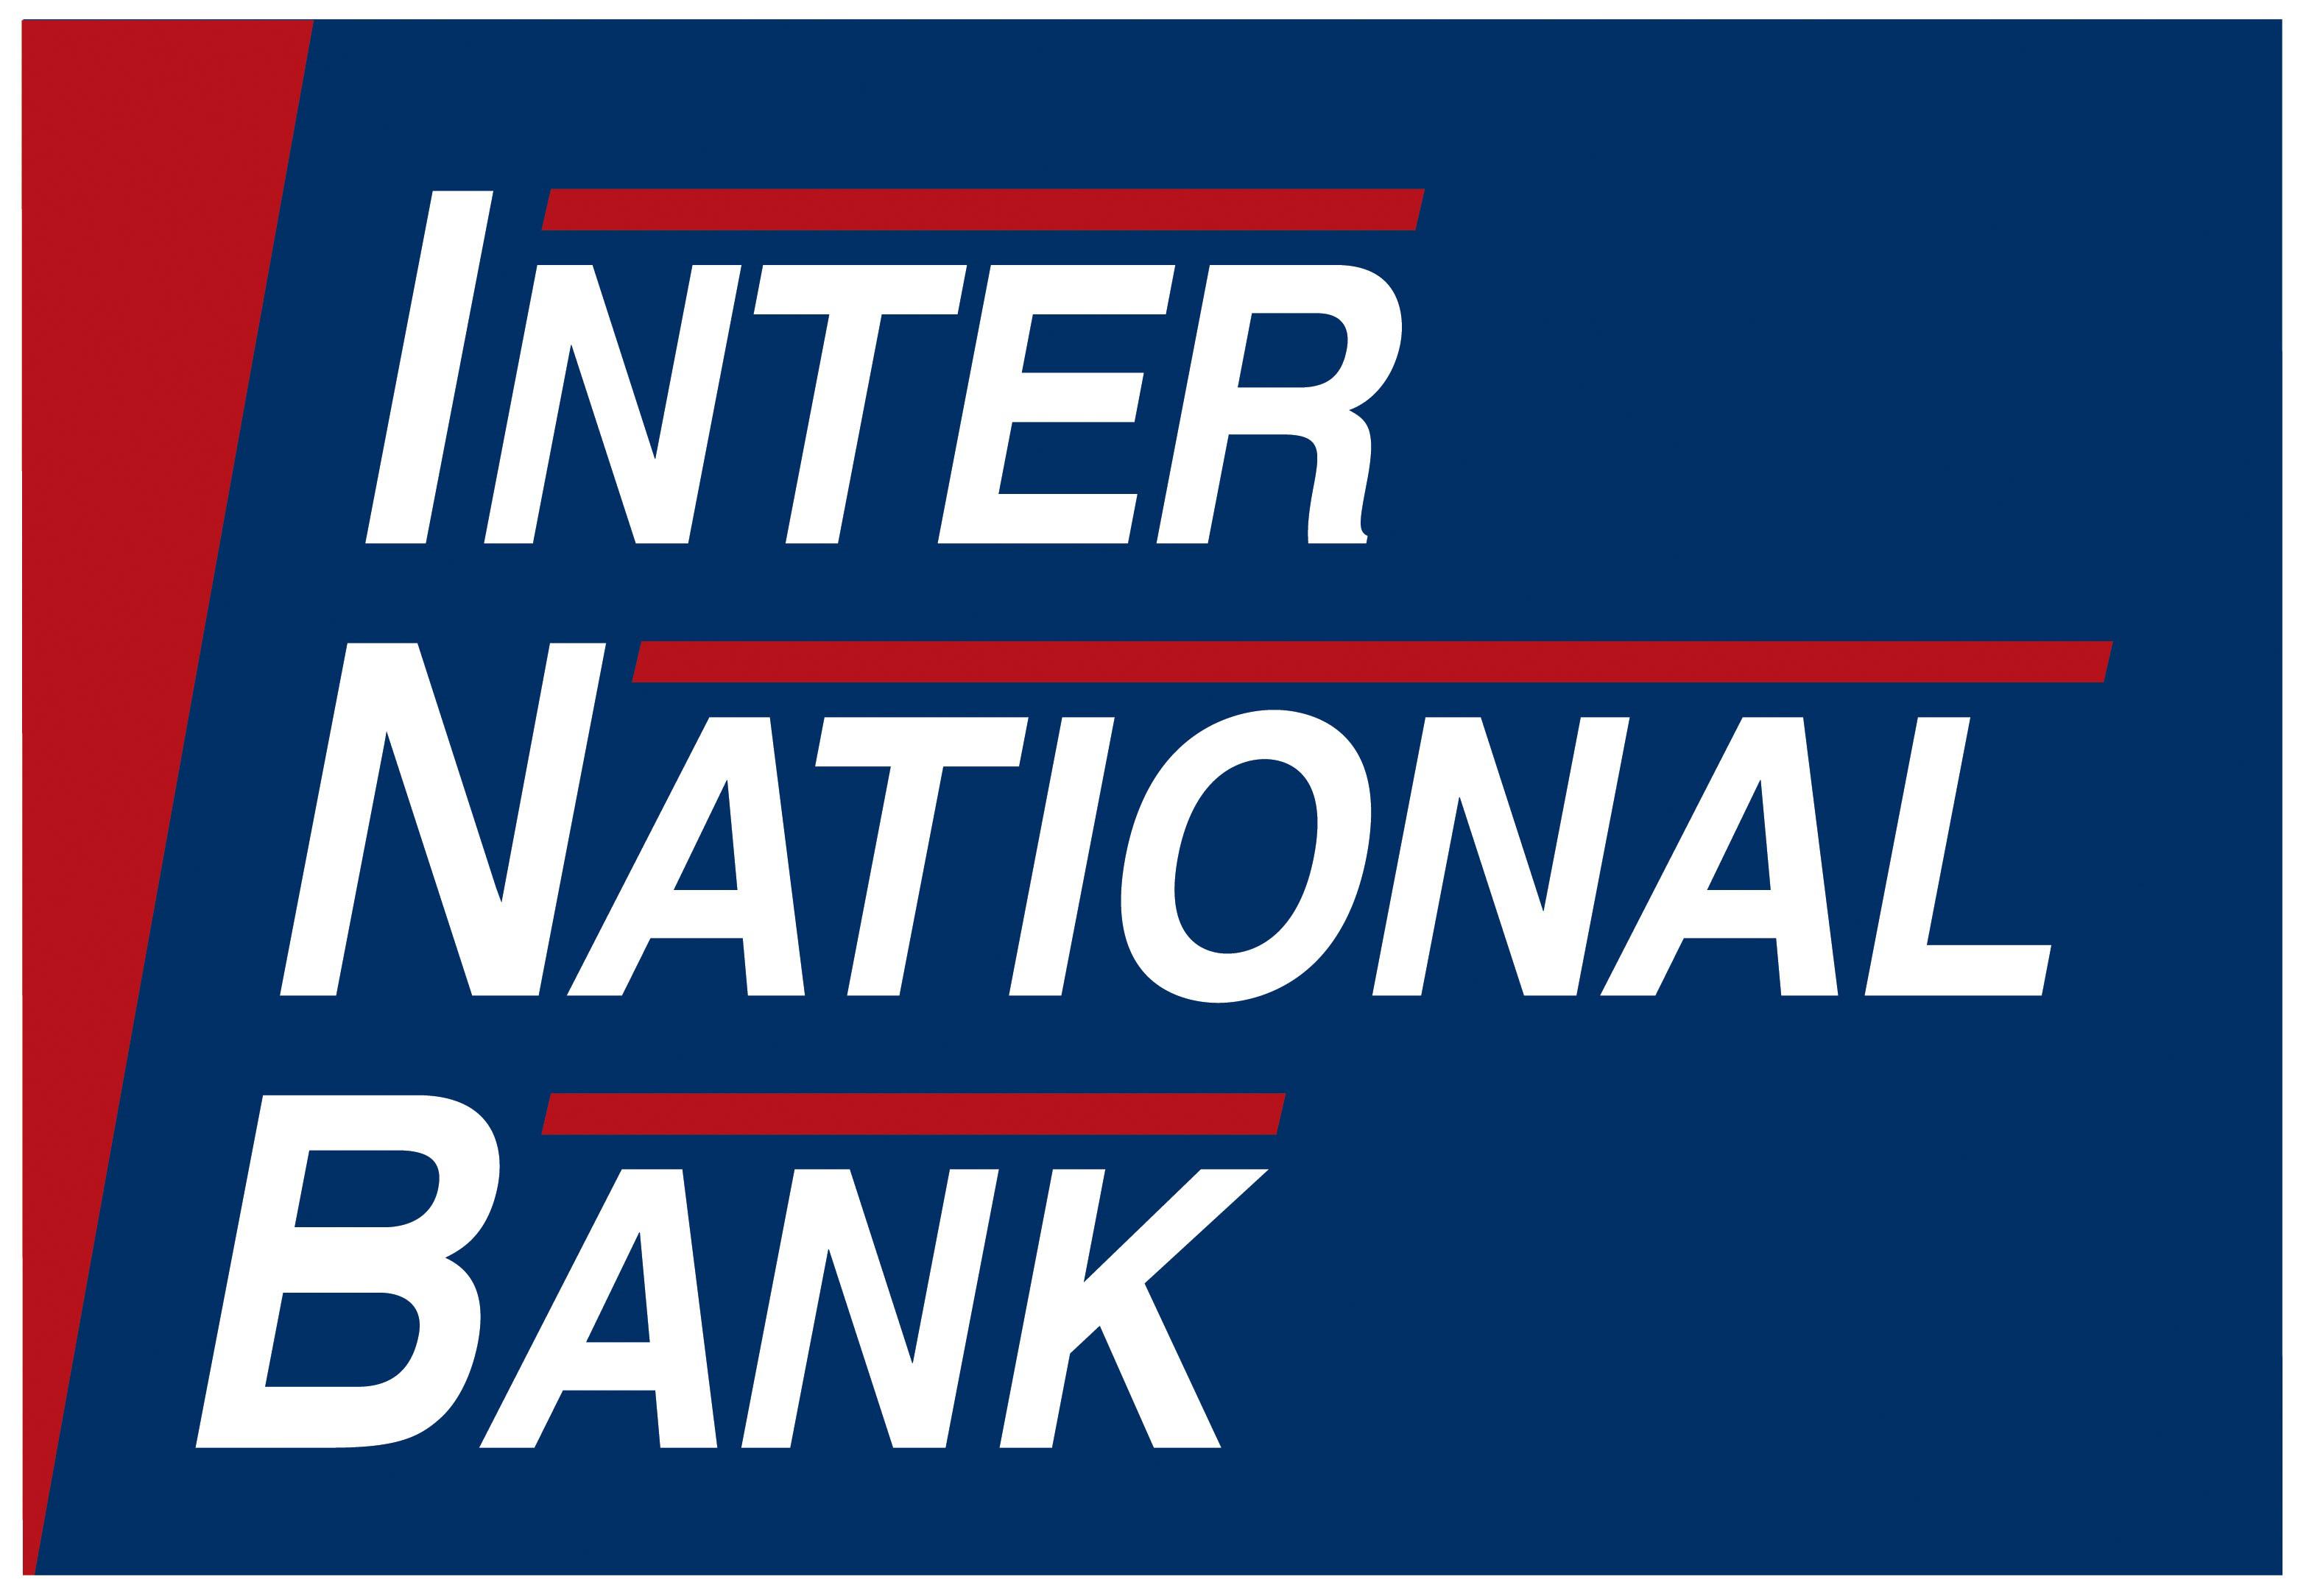 Inter National Bank logo